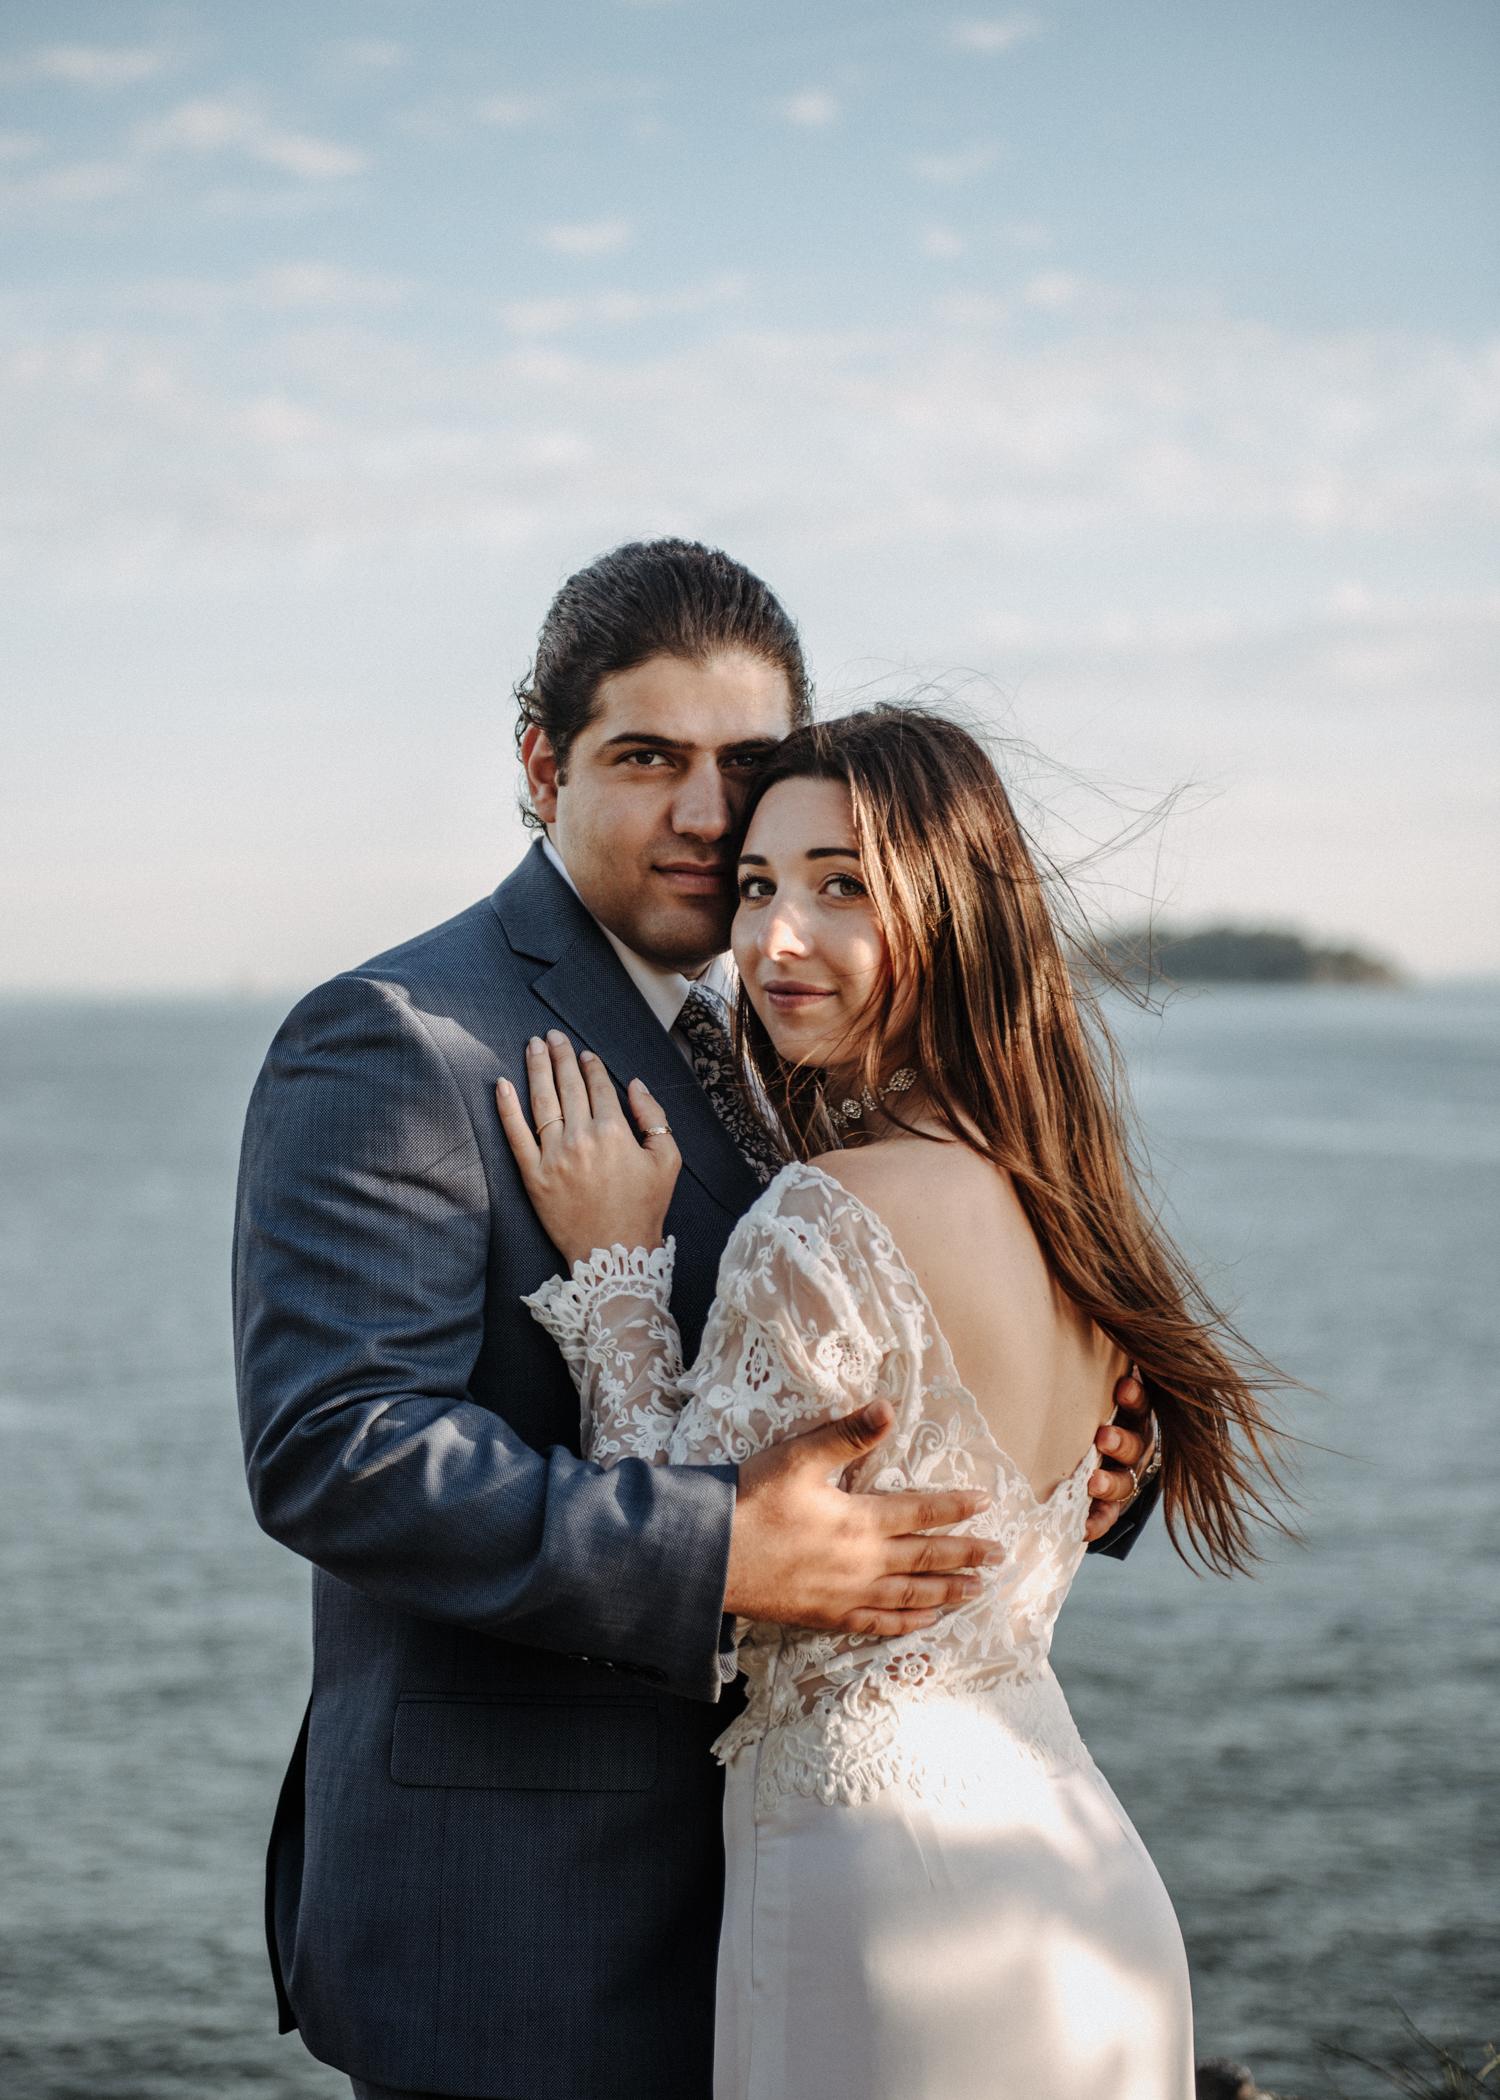 kaoverii_silva_photographer_lison_iman_wedding_websize-309.jpg